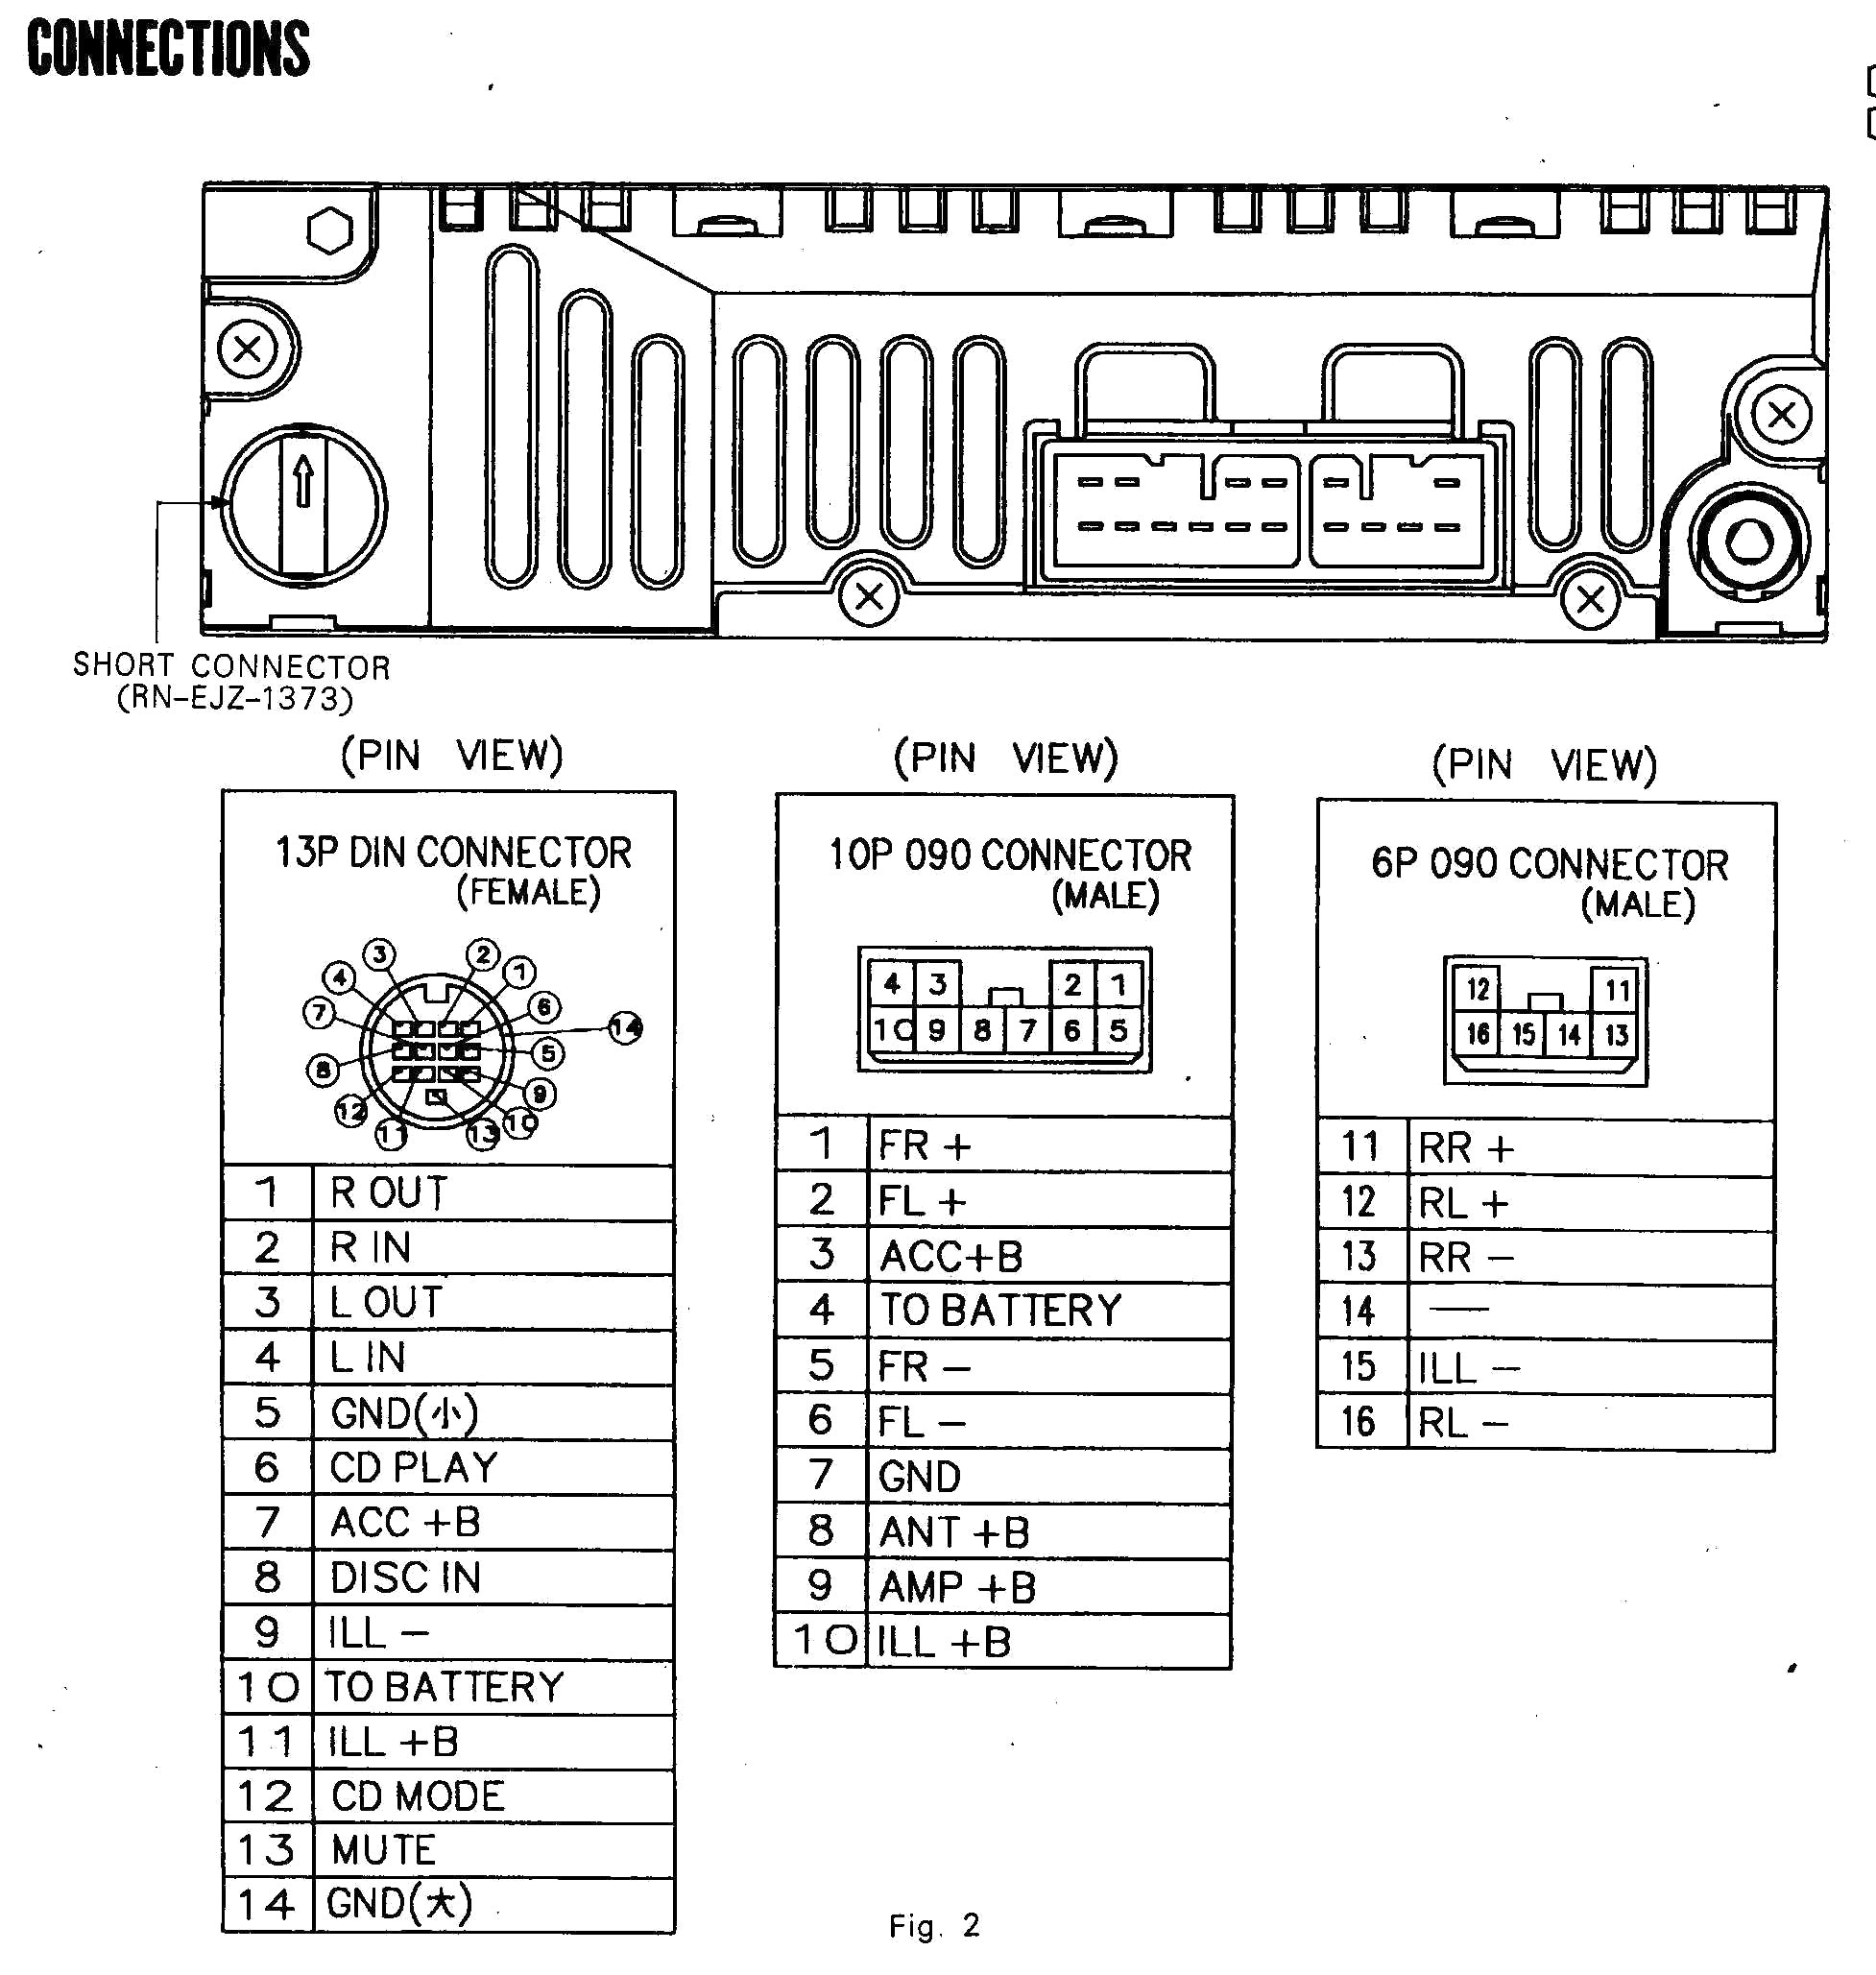 Pioneer Mixtrax Wiring Diagram - Great Installation Of Wiring Diagram • - Pioneer Mixtrax Wiring Diagram